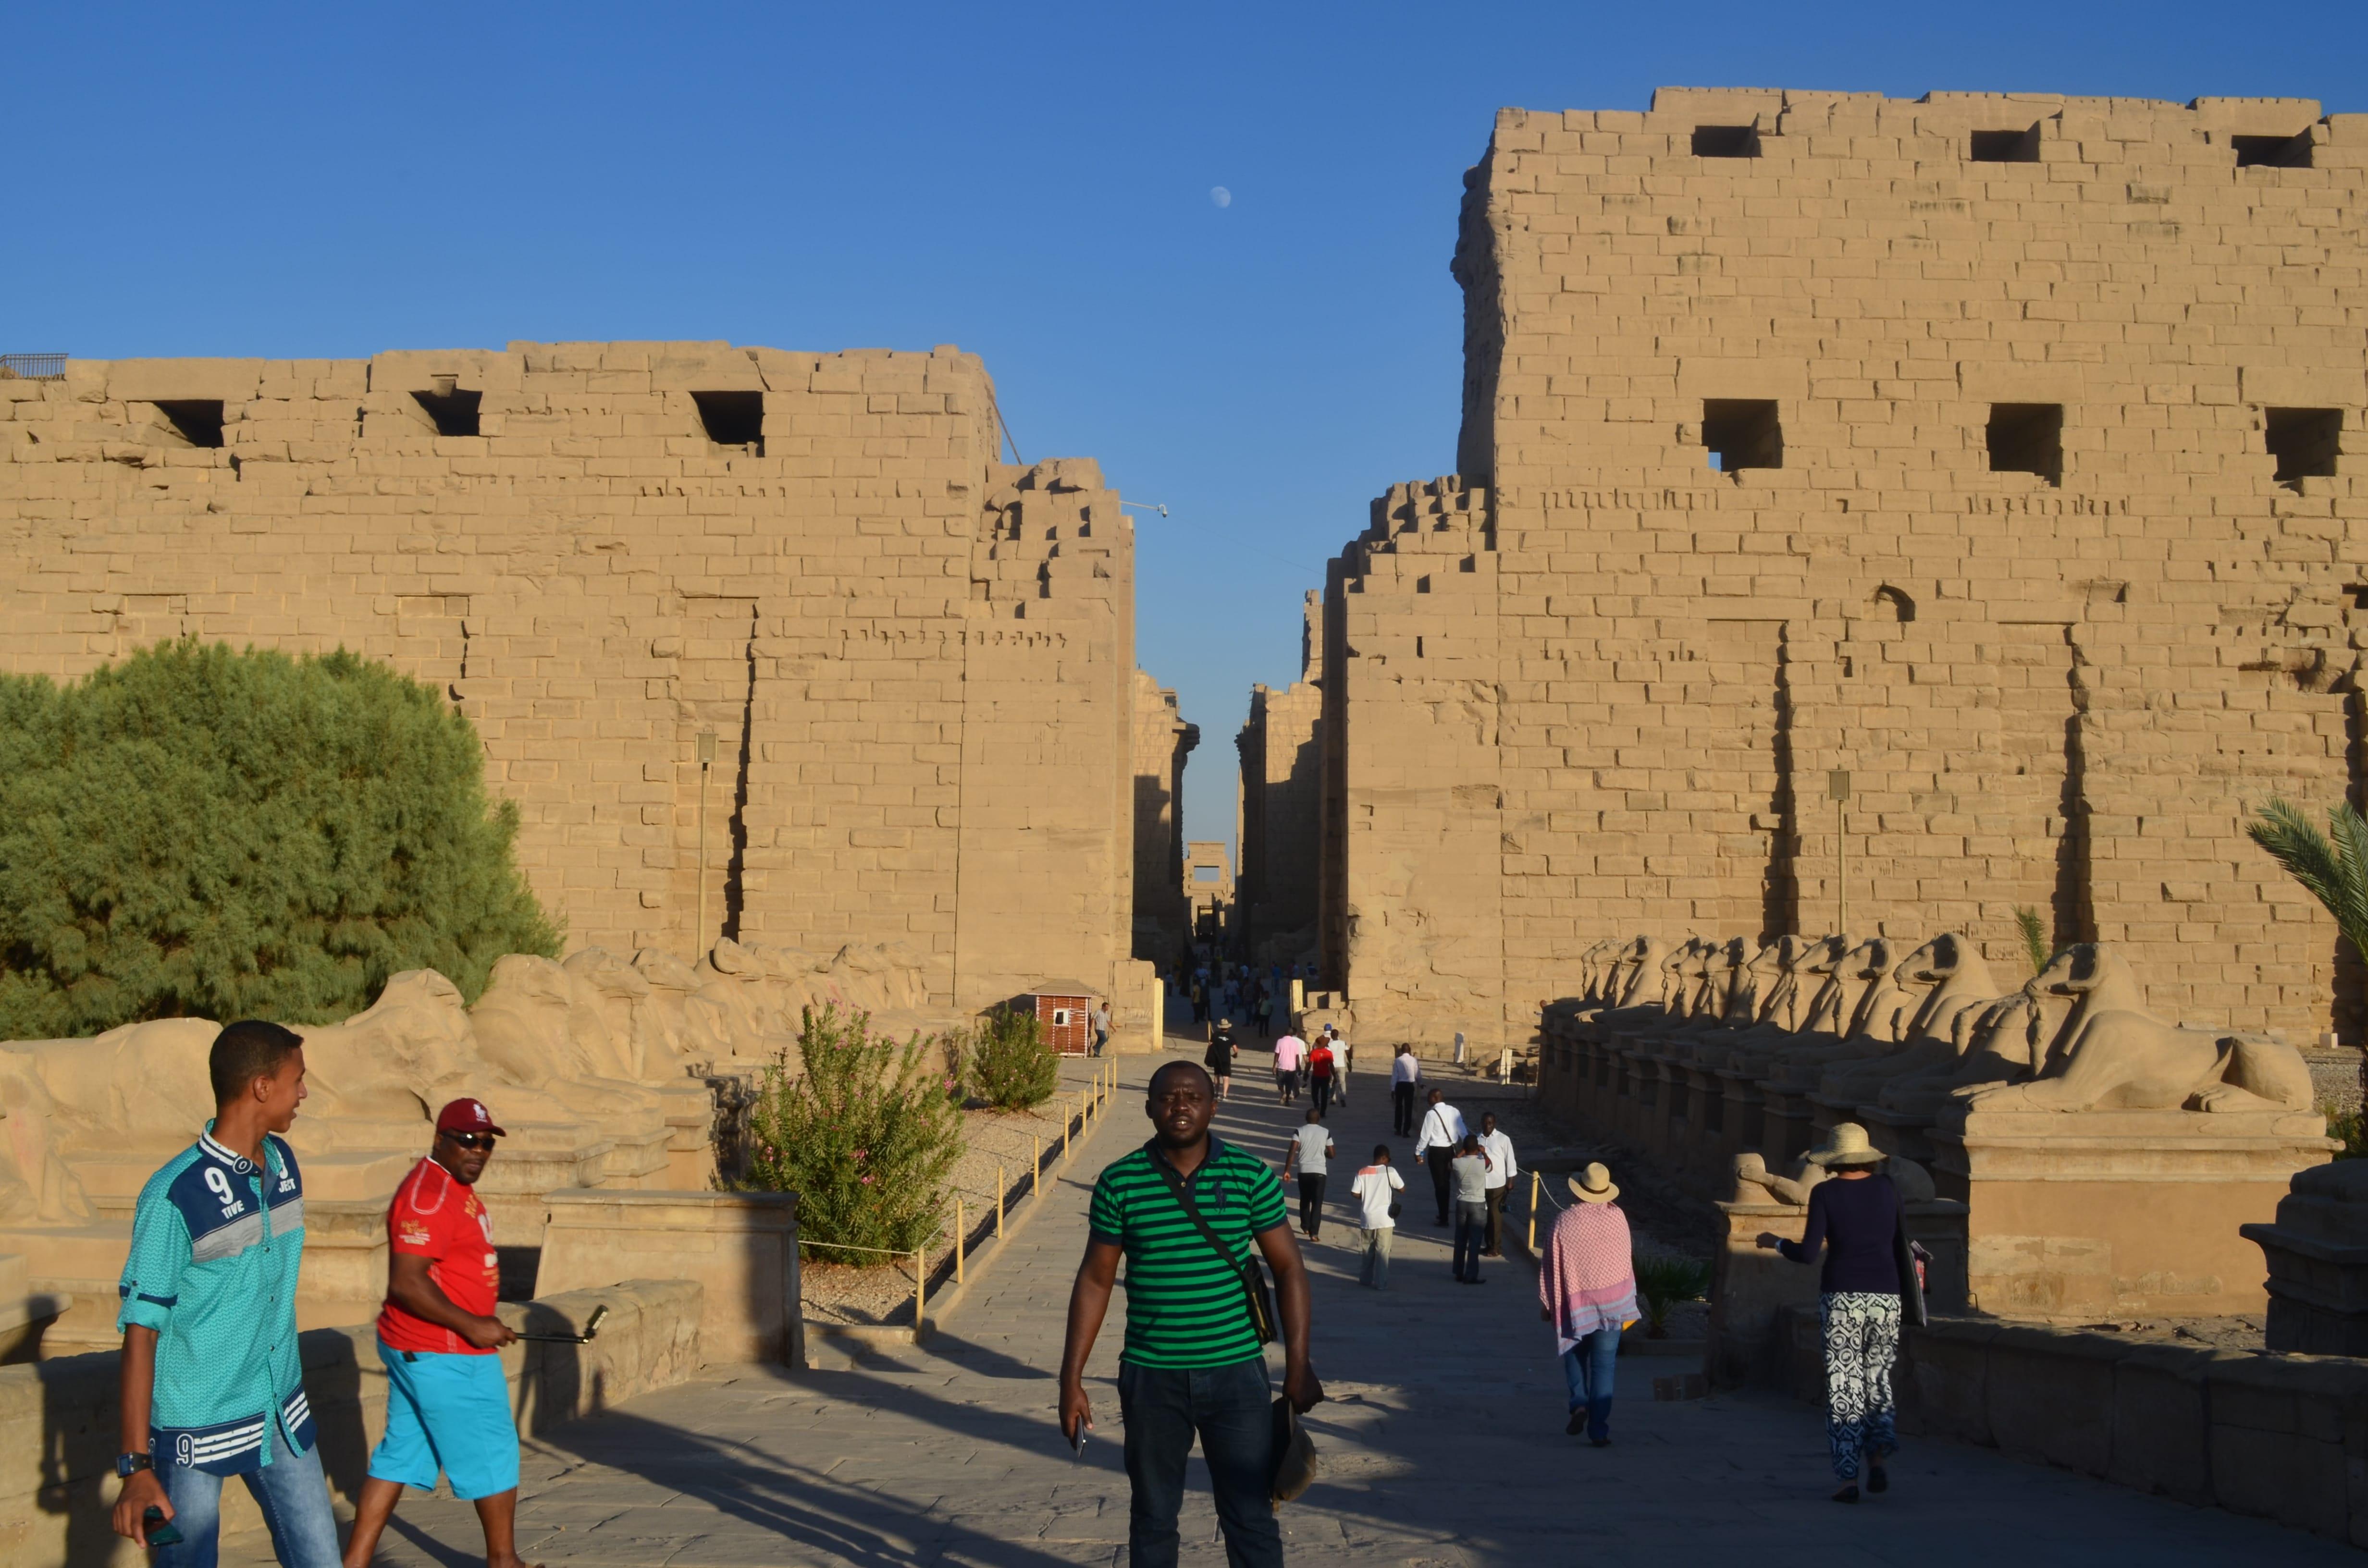 Vista del Templo de Karnak en Egitpo, durante la tarde